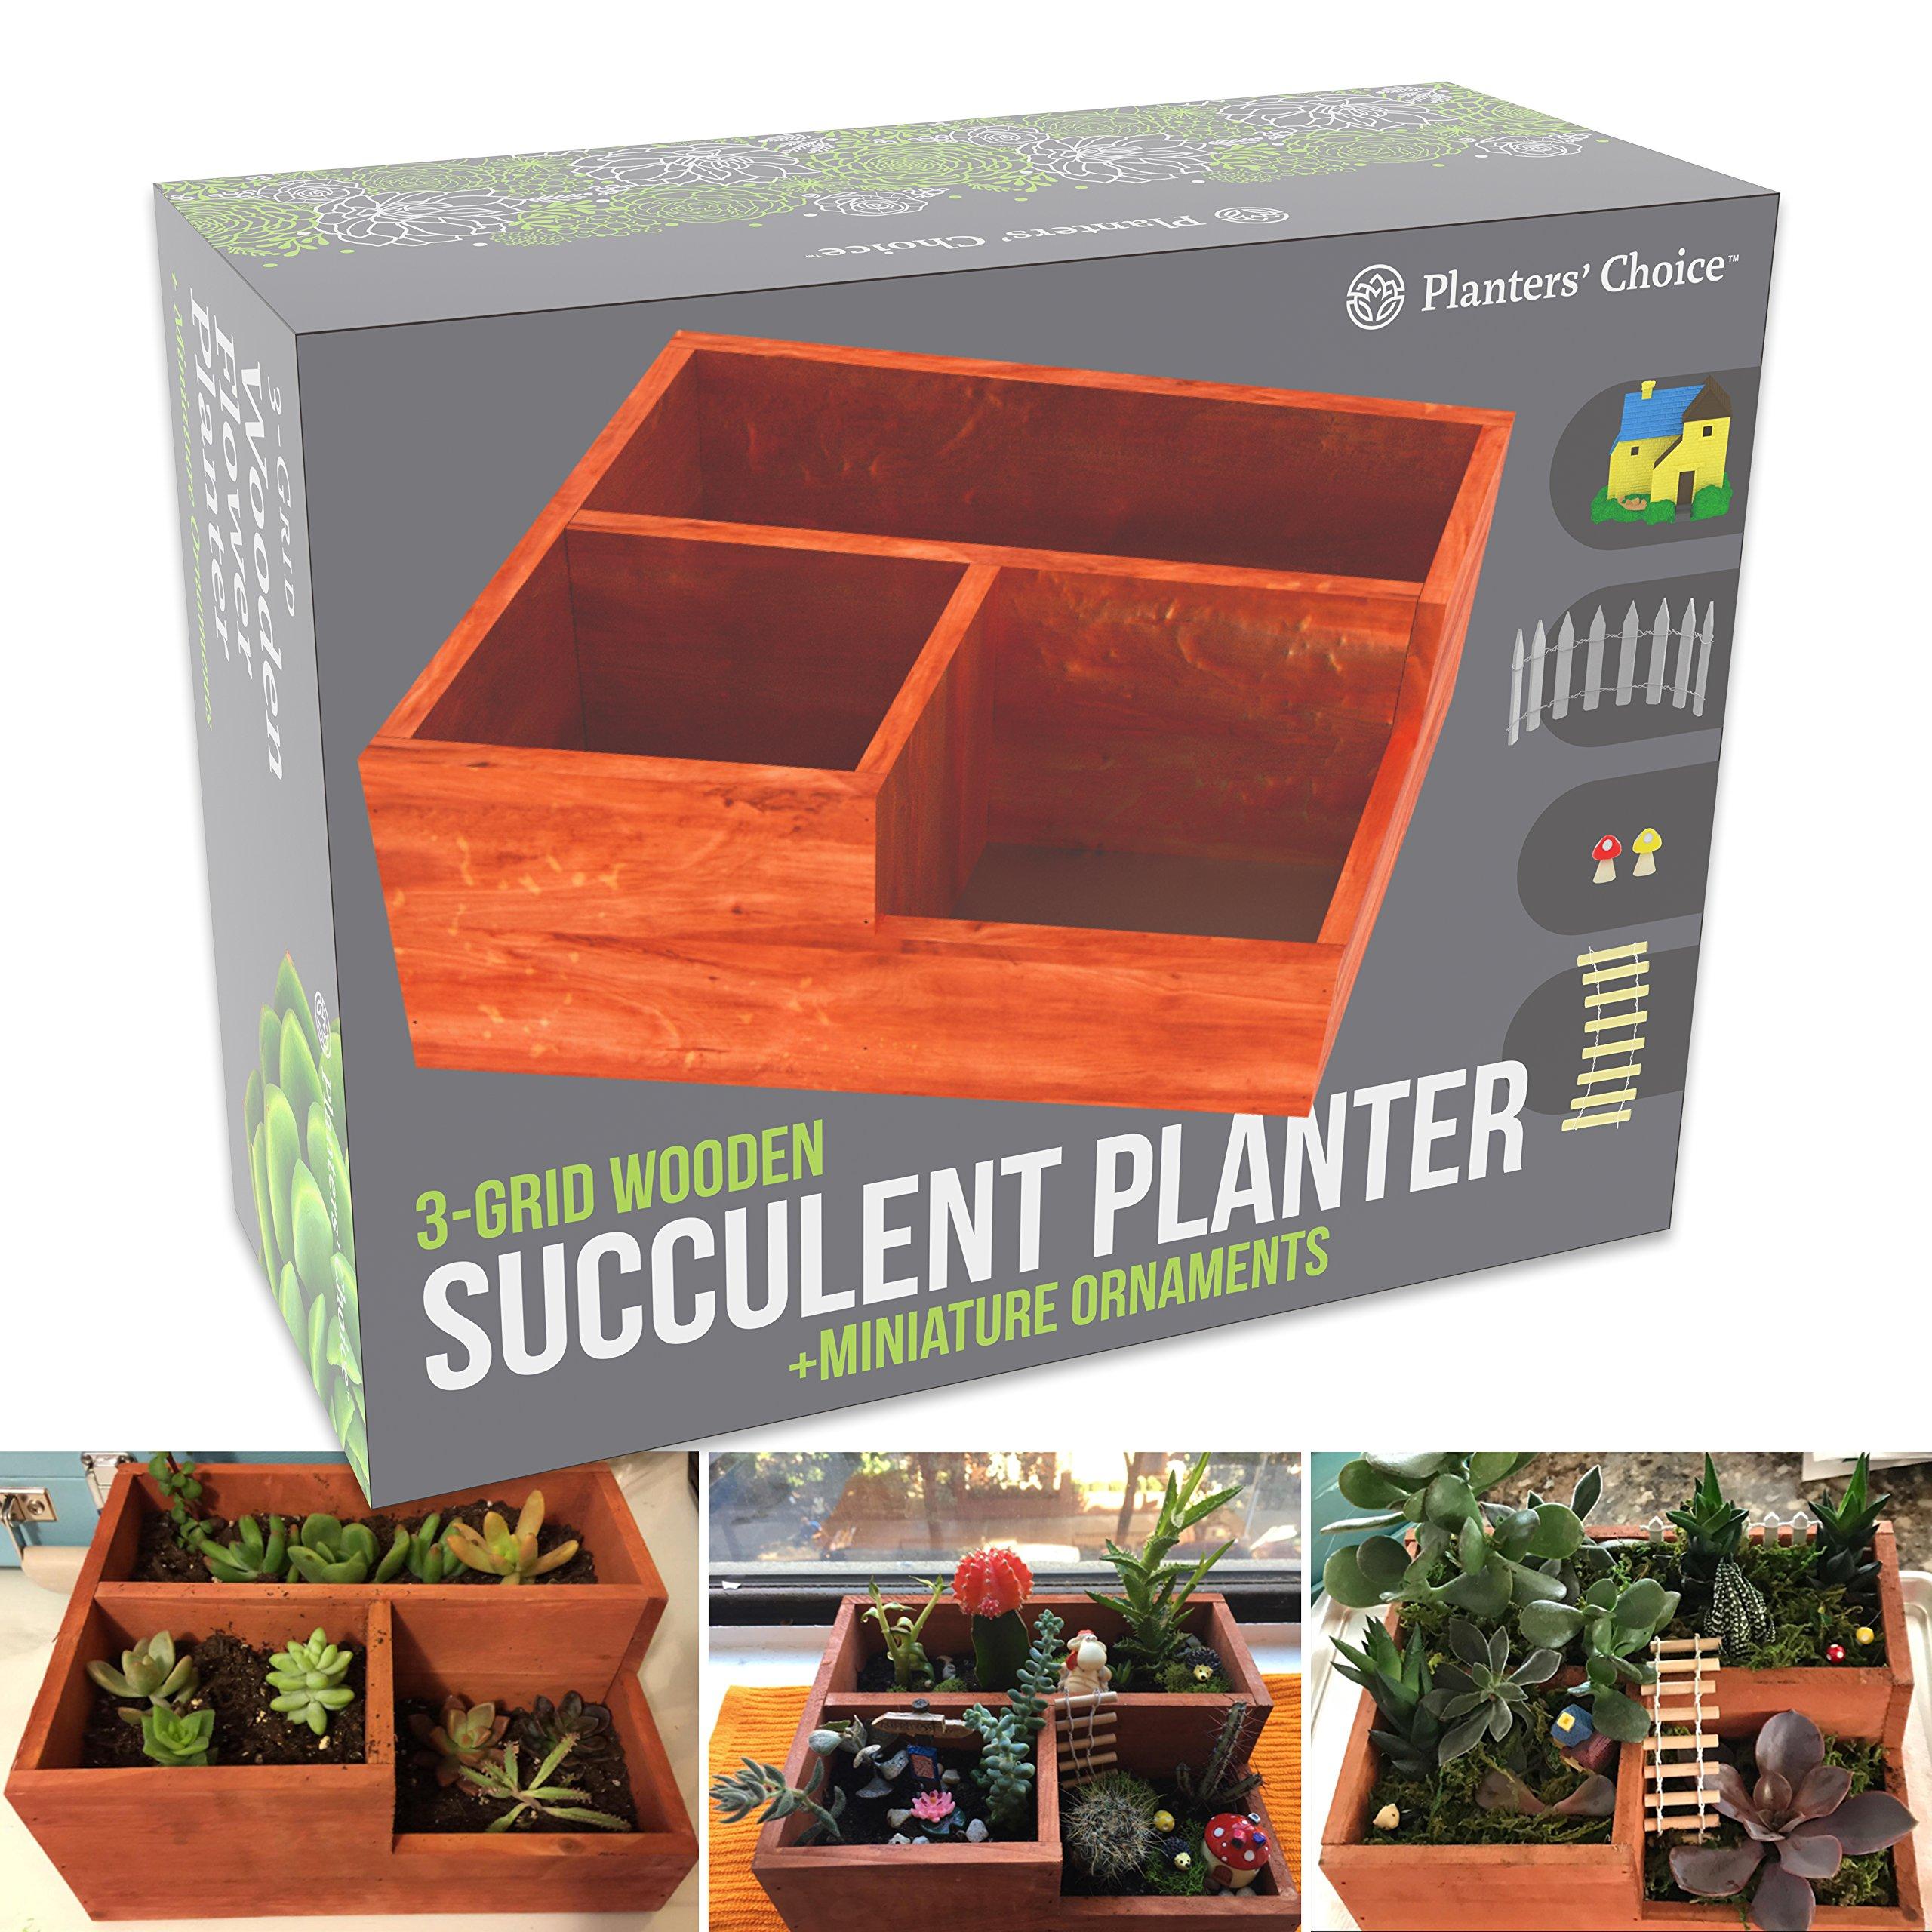 Cheap long wooden planter box find long wooden planter box deals on get quotations 3 grid wooden succulent flower planter box 5 miniature ornaments drainage holes izmirmasajfo